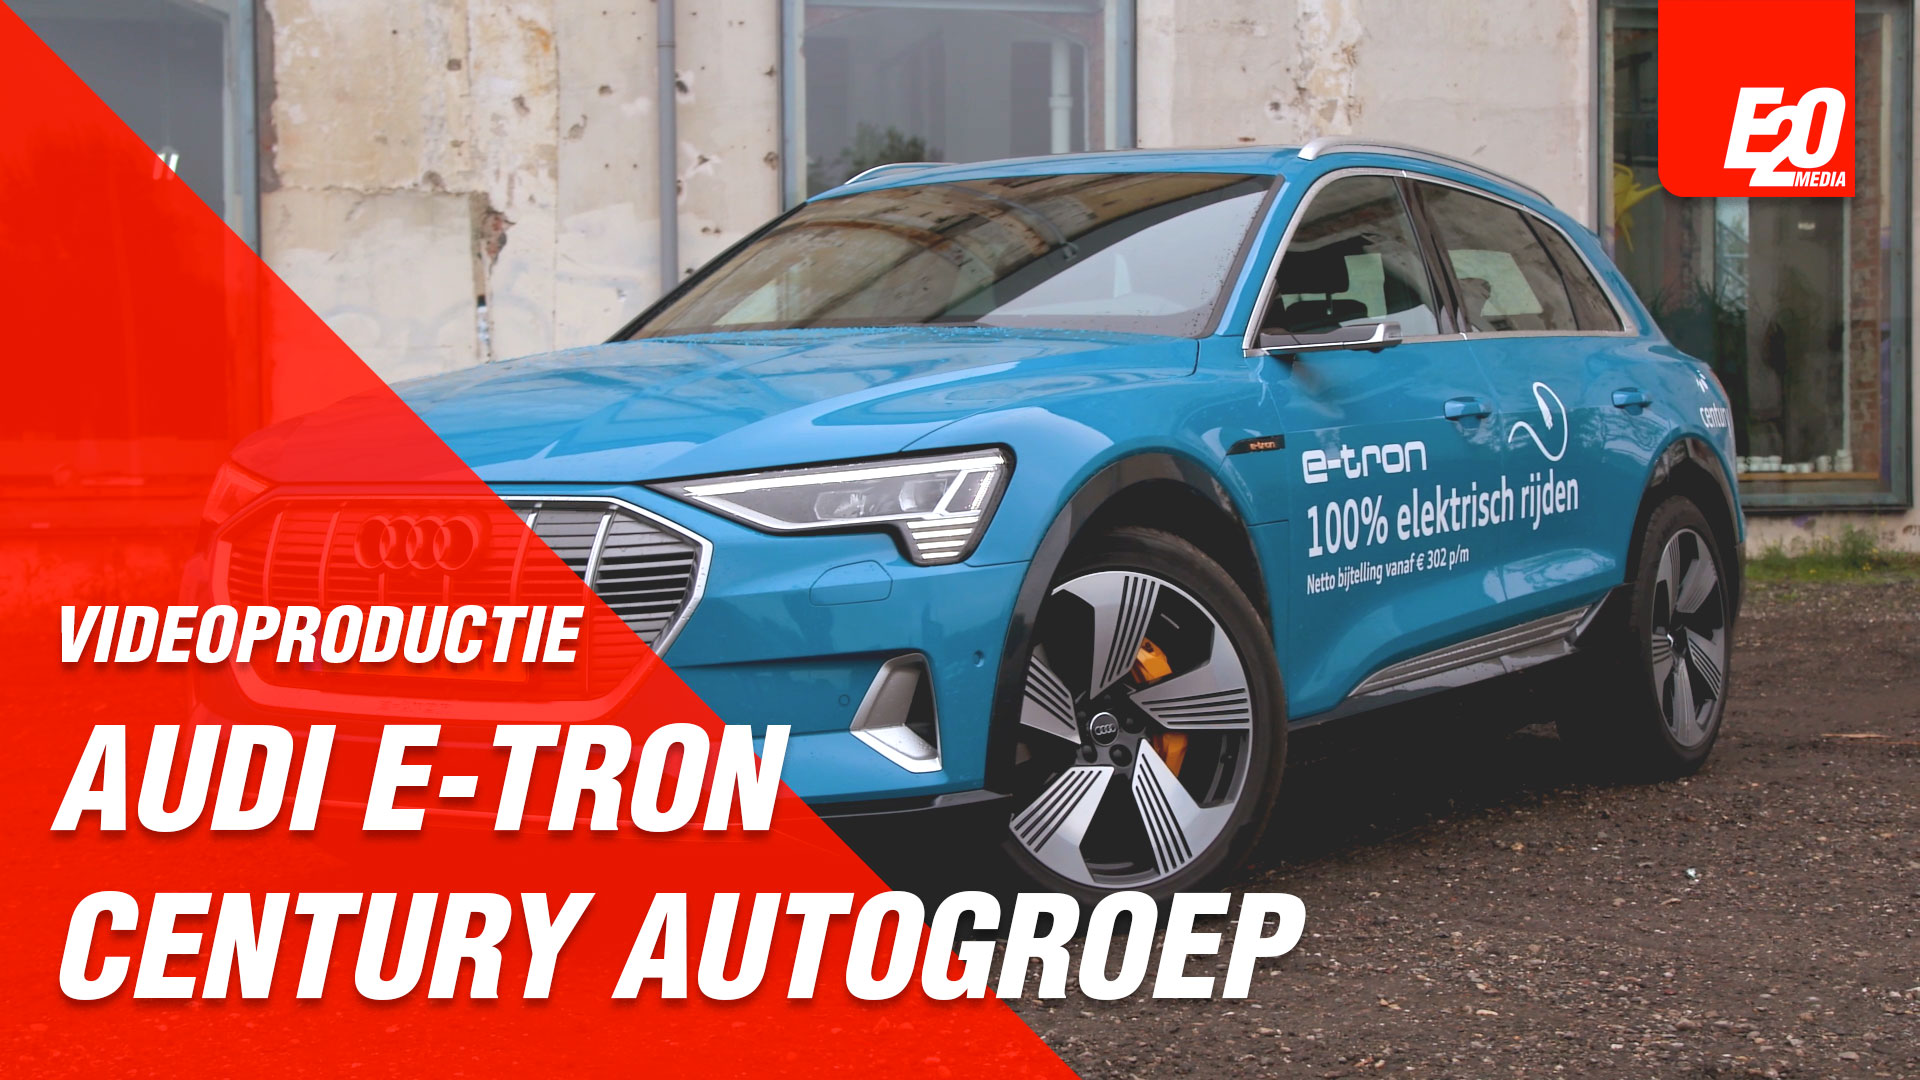 Social Media Video Century Autogroep (Audi E-tron)